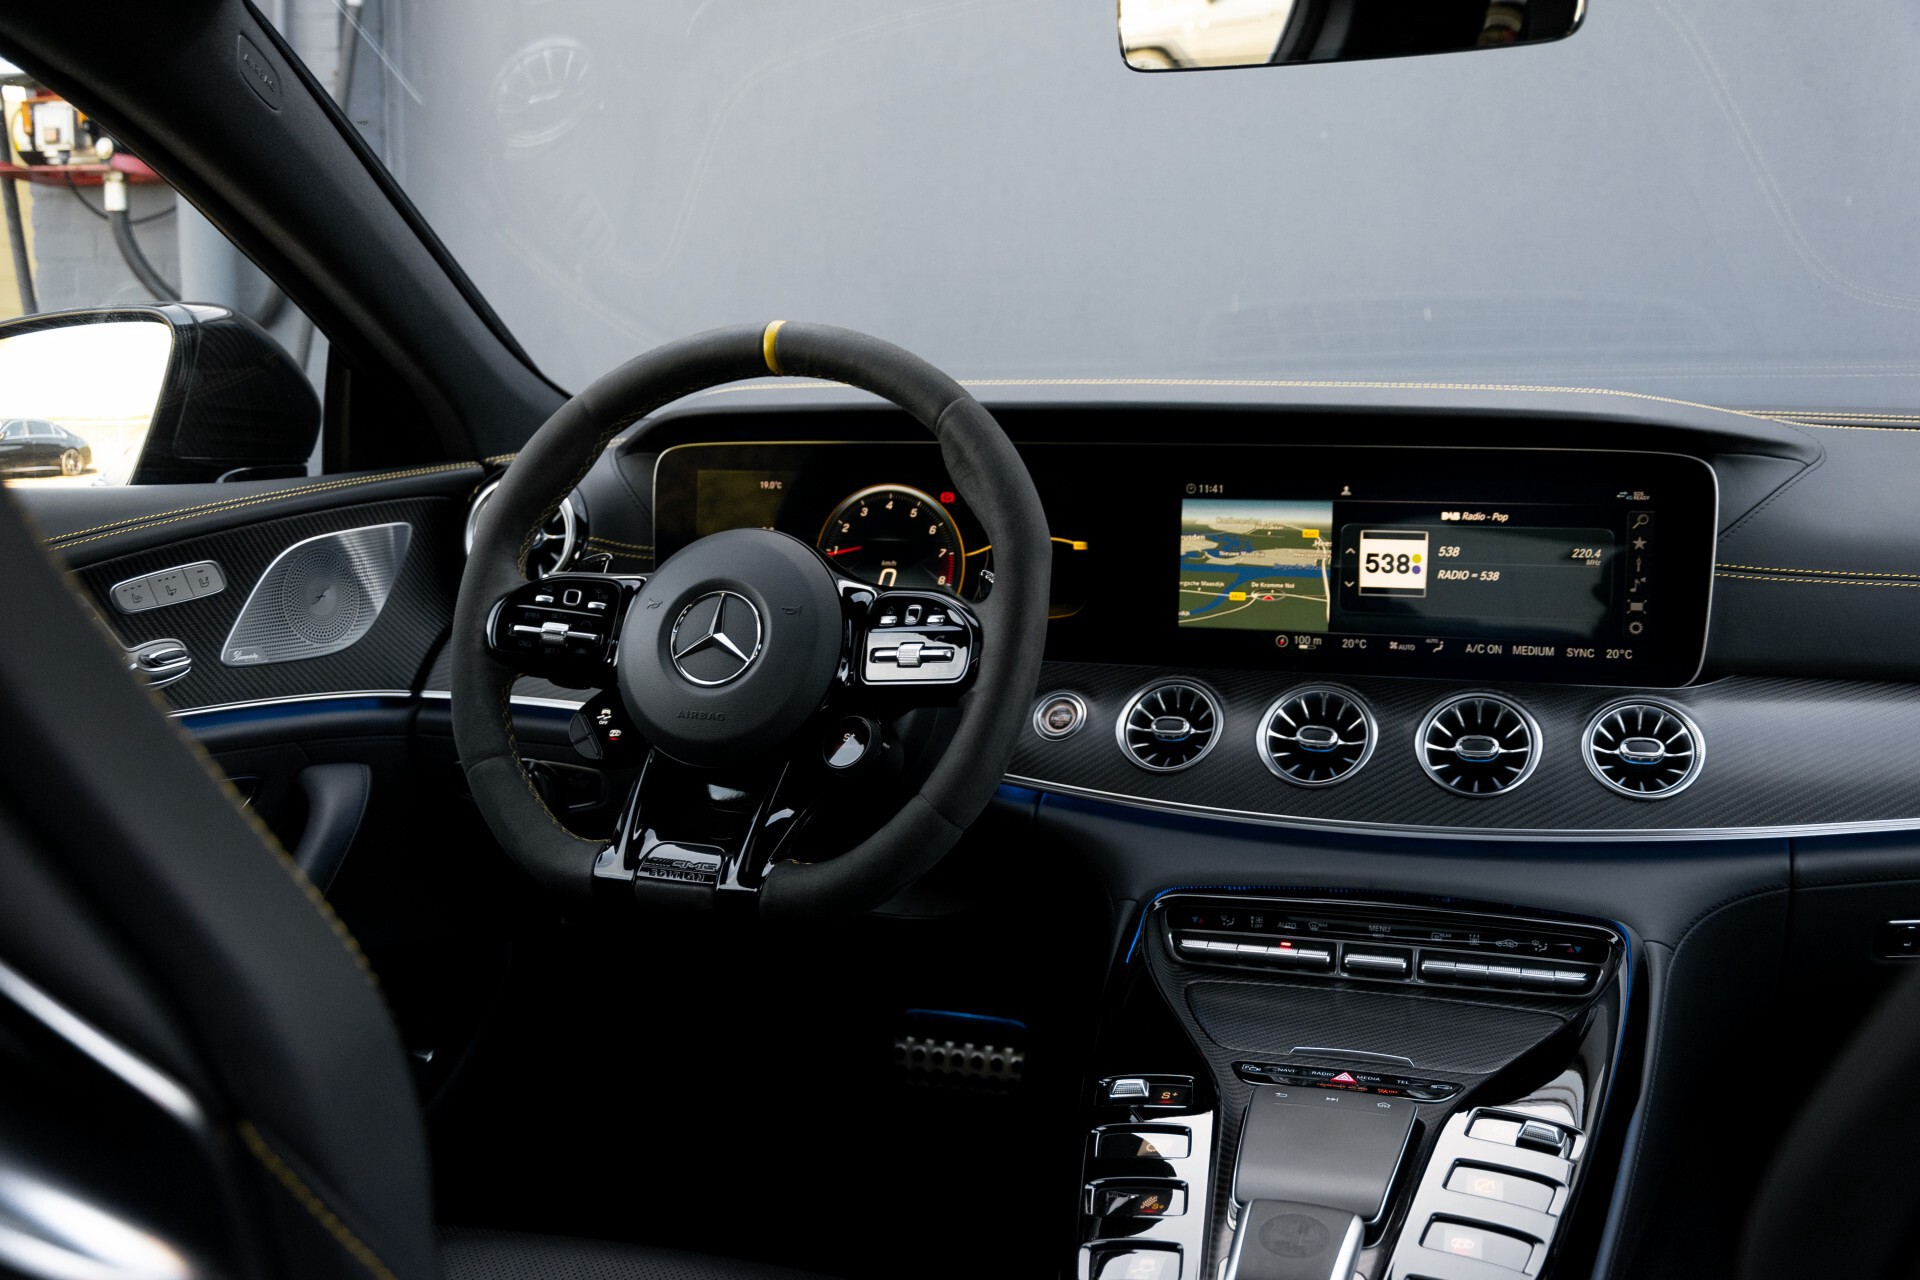 Mercedes-Benz AMG GT 4-Door Coupe 63 S 4MATIC+ Edition 1 Keramisch/Carbon/First Class/Dynamic Plus/Burmester High End 3D Aut9 Foto 7